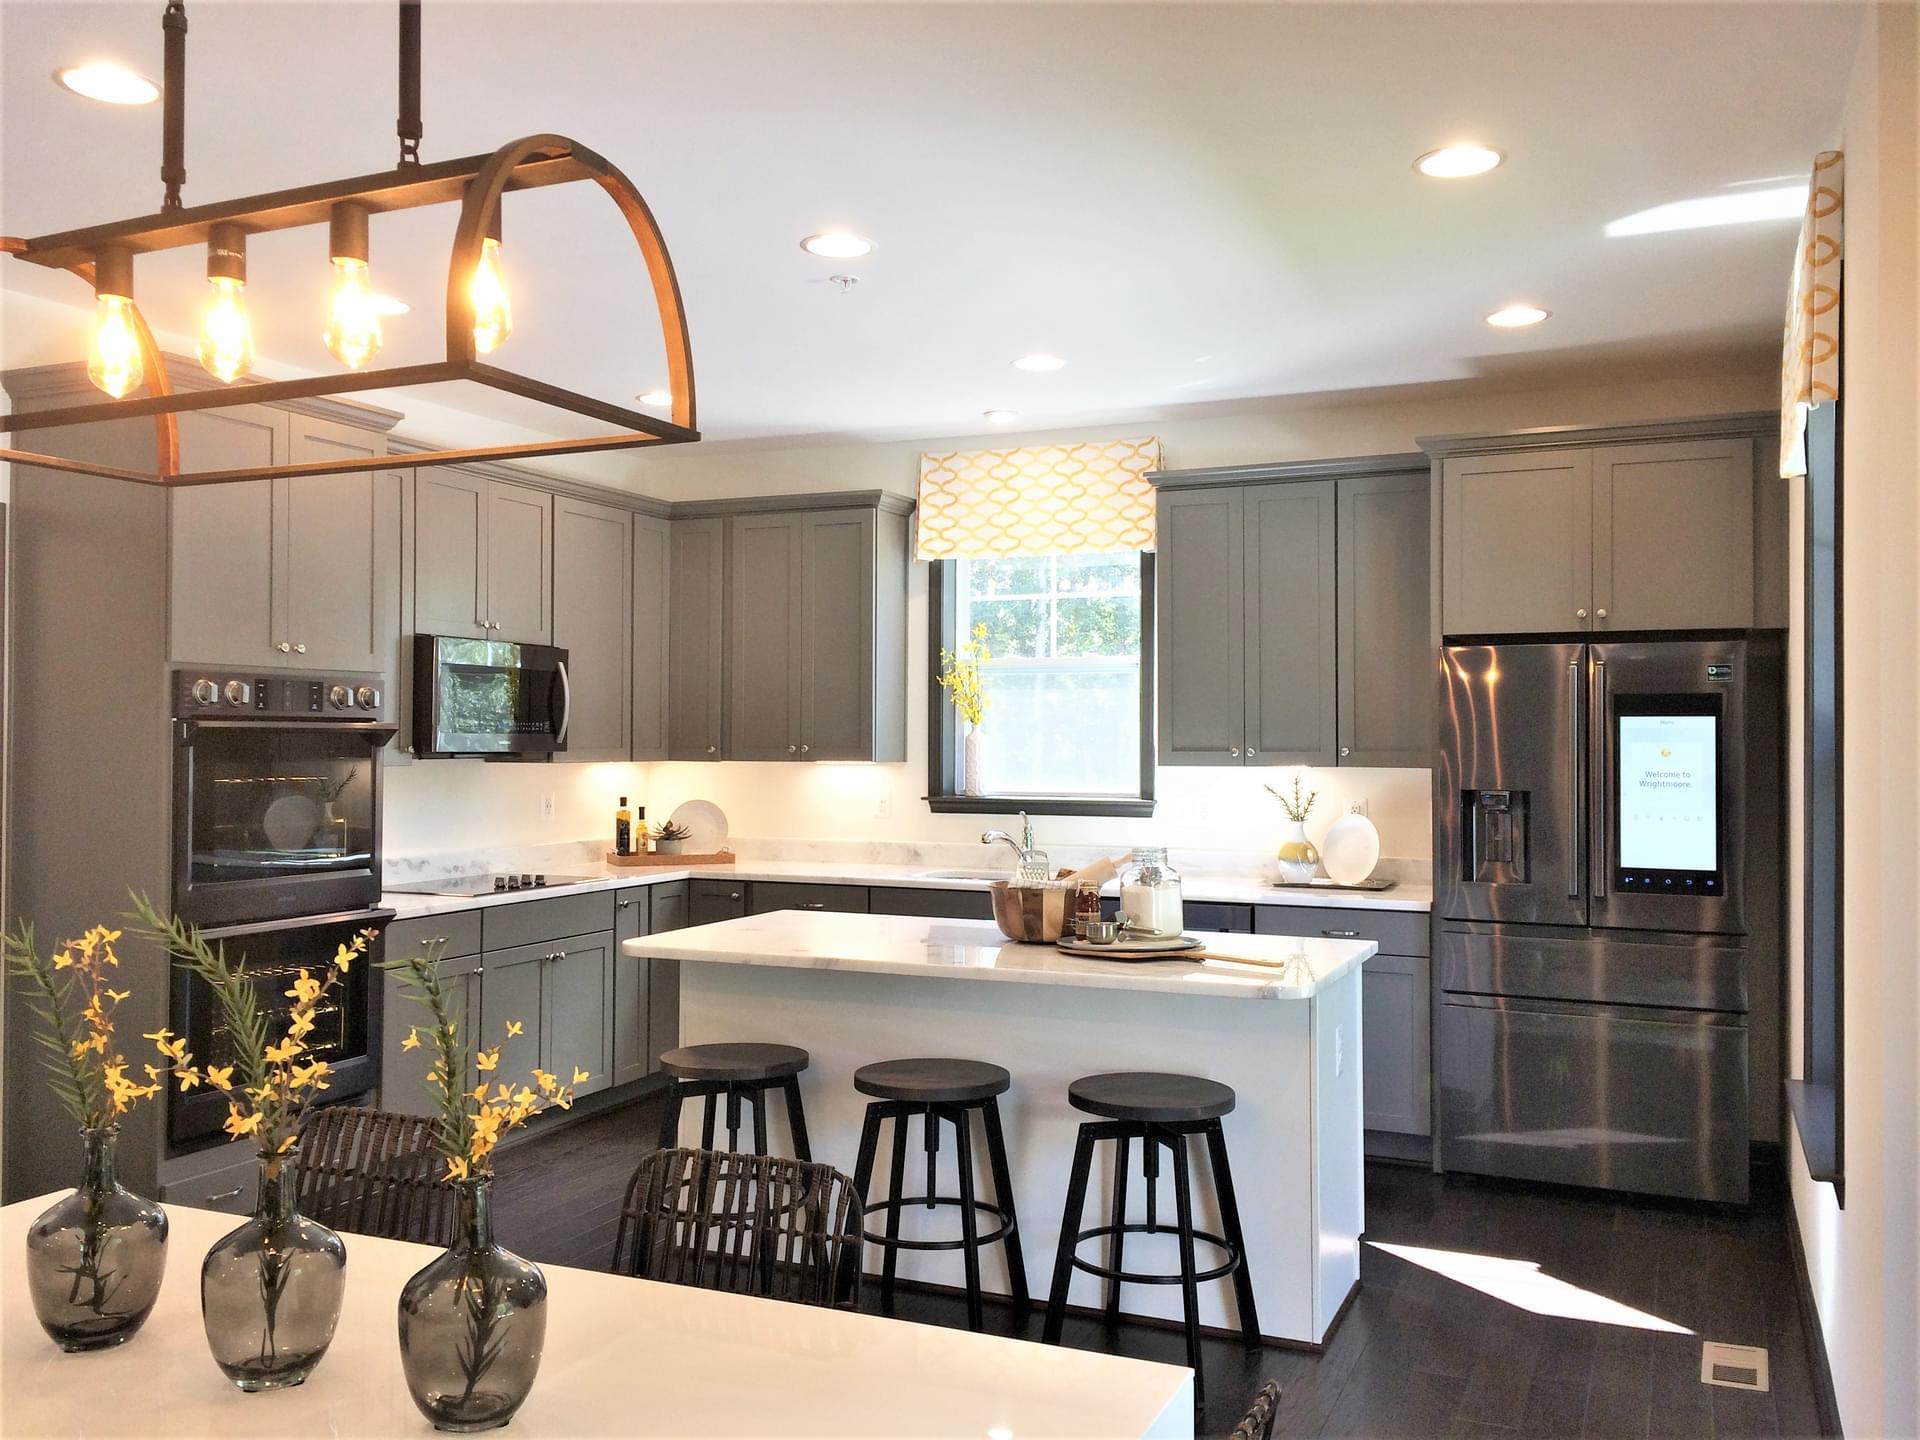 Favorite Kitchen Appliances for 2021